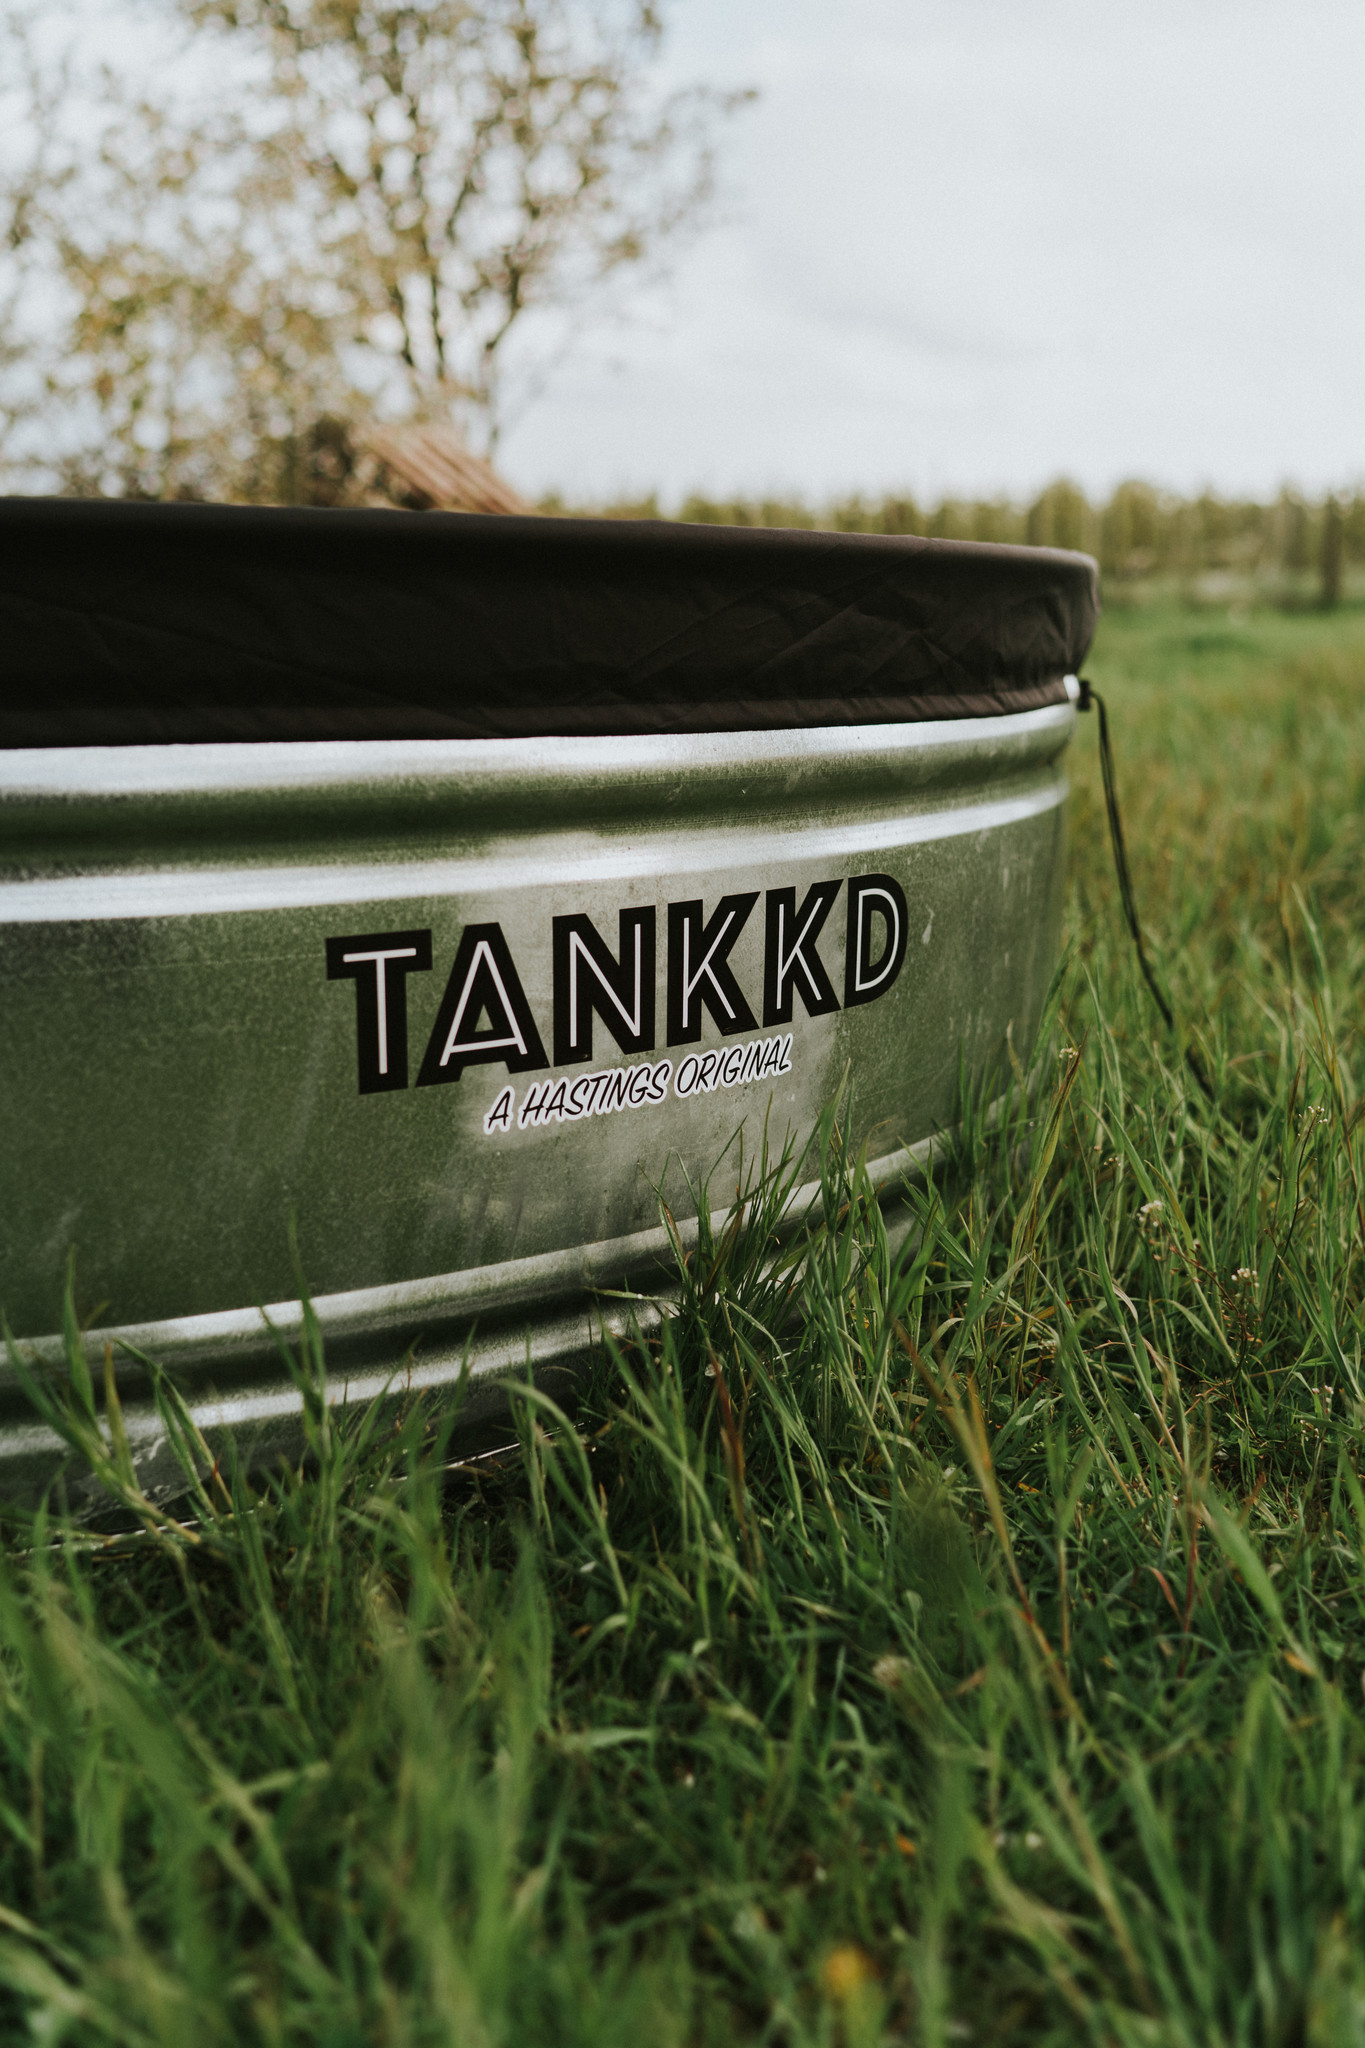 Tankkd Eskimo pack basic-8